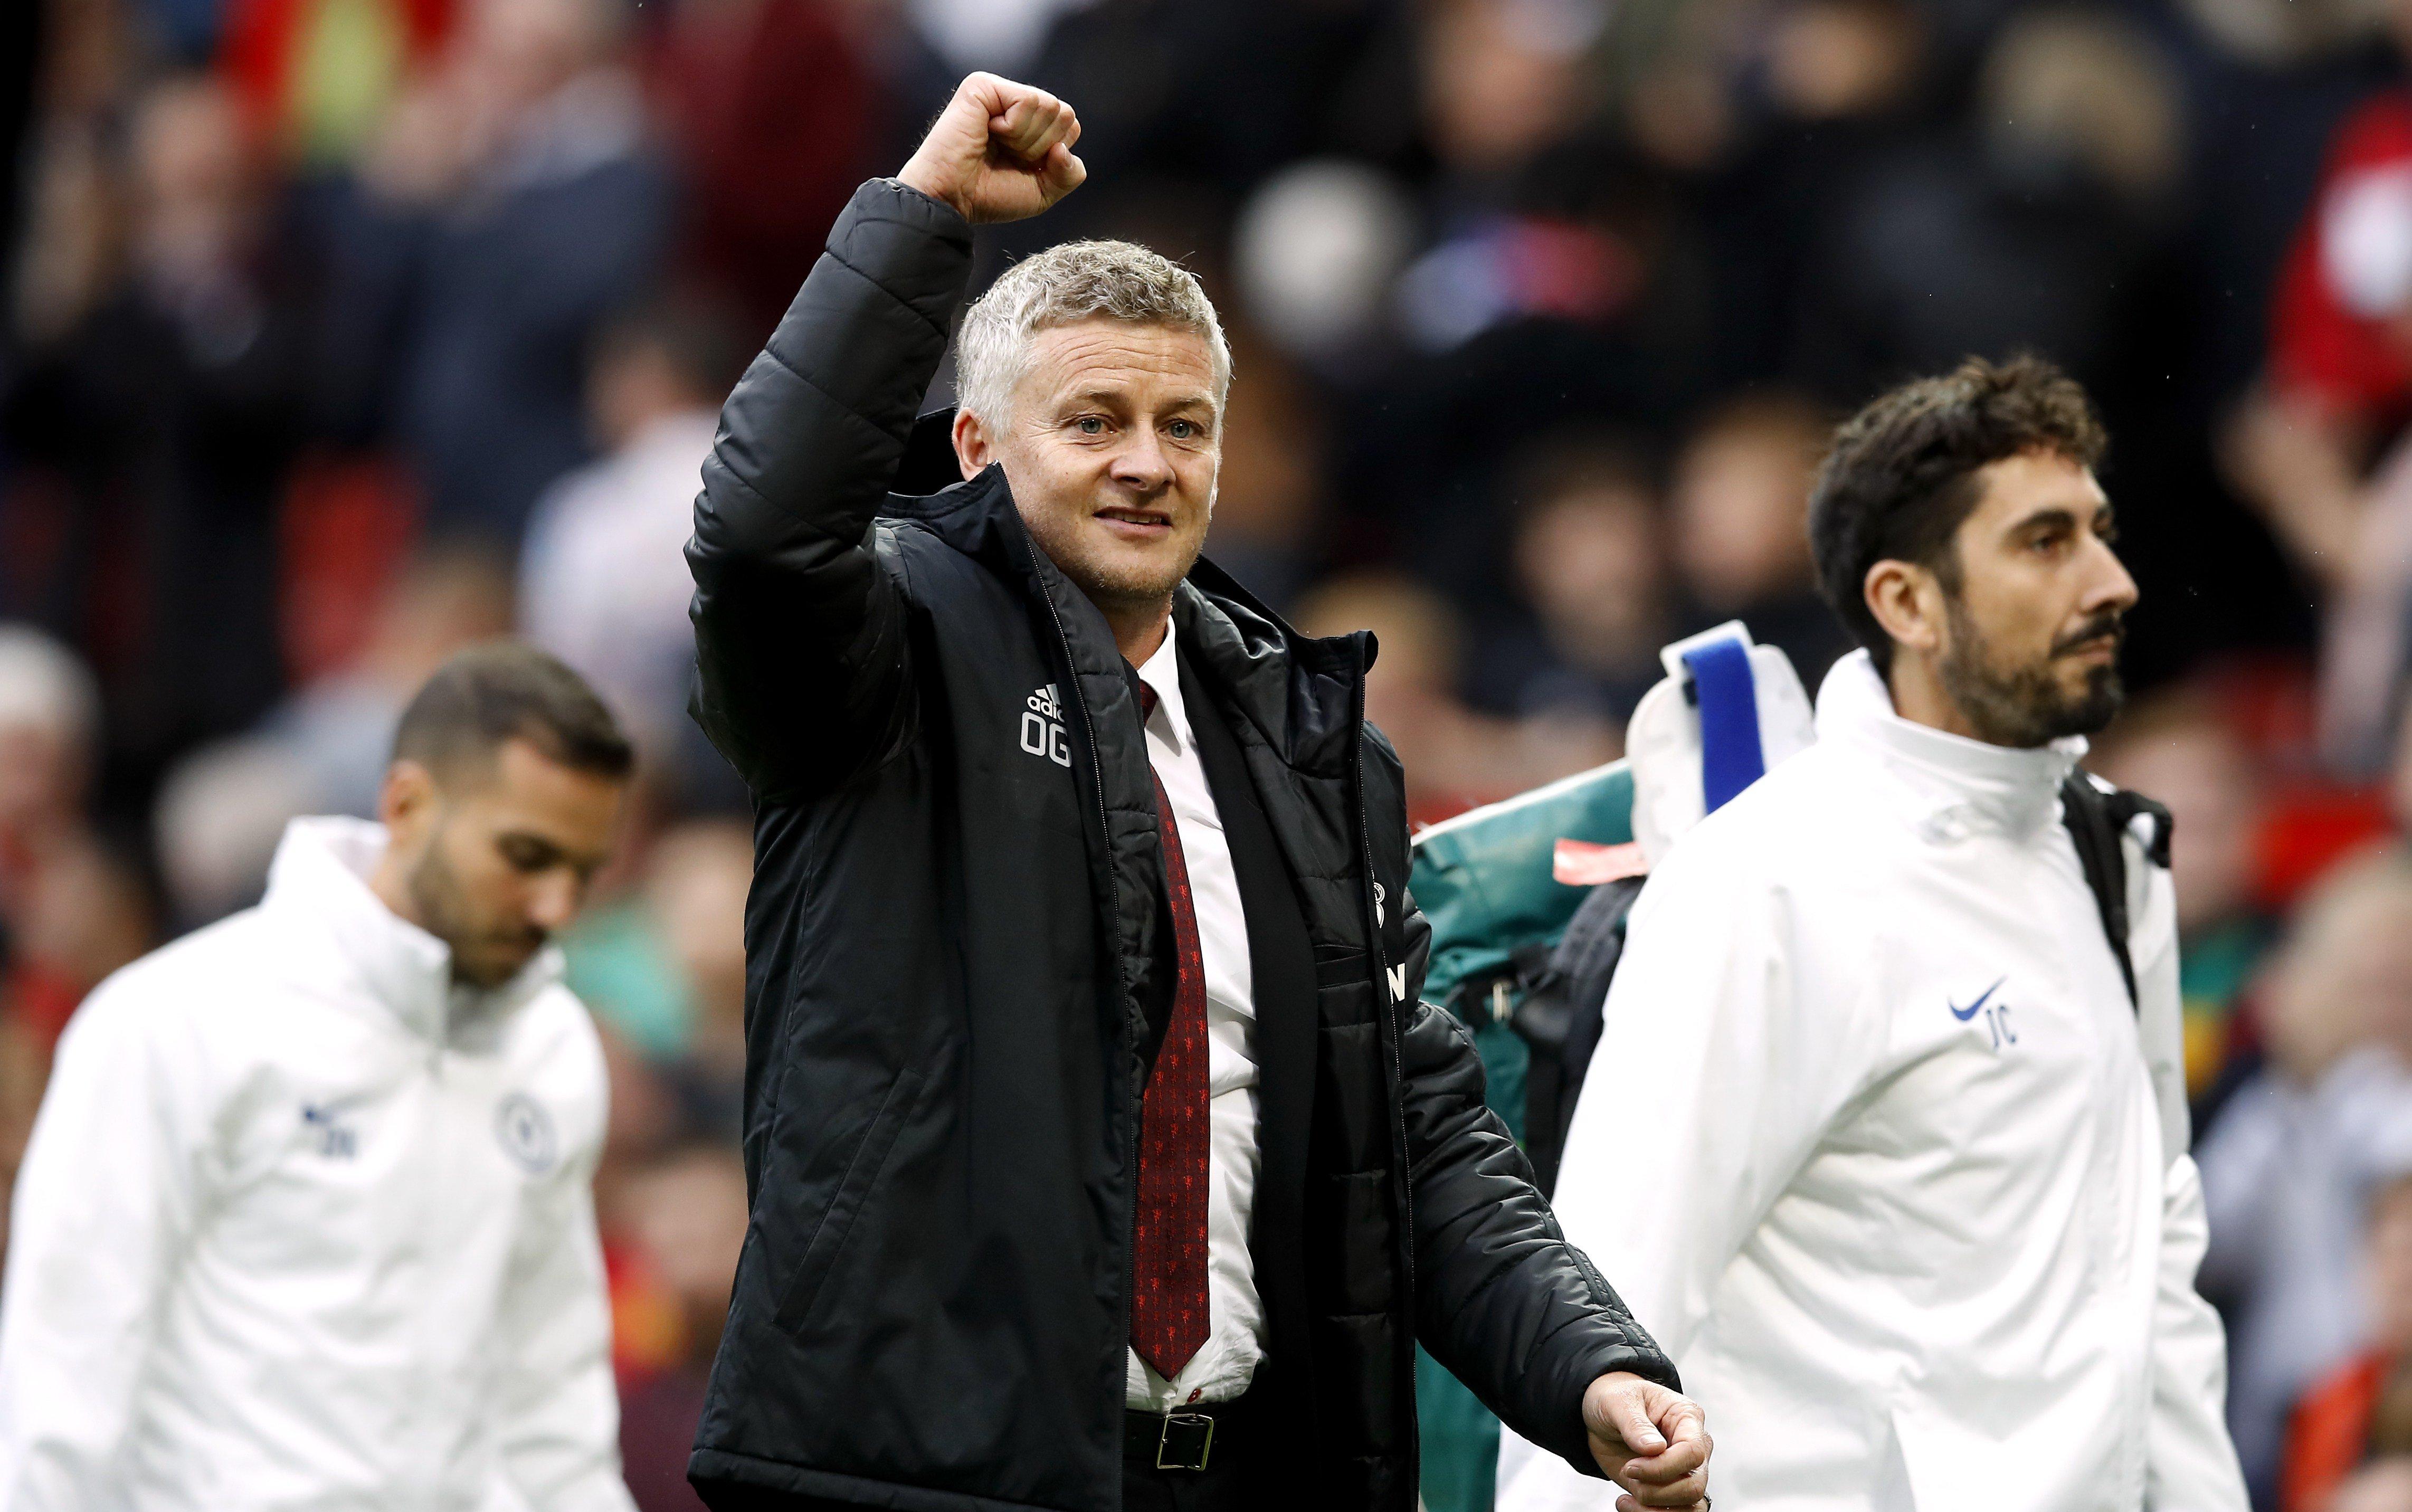 Ole Gunnar Solskjaer makes signing Jadon Sancho his top priority for Manchester United in January - Bóng Đá